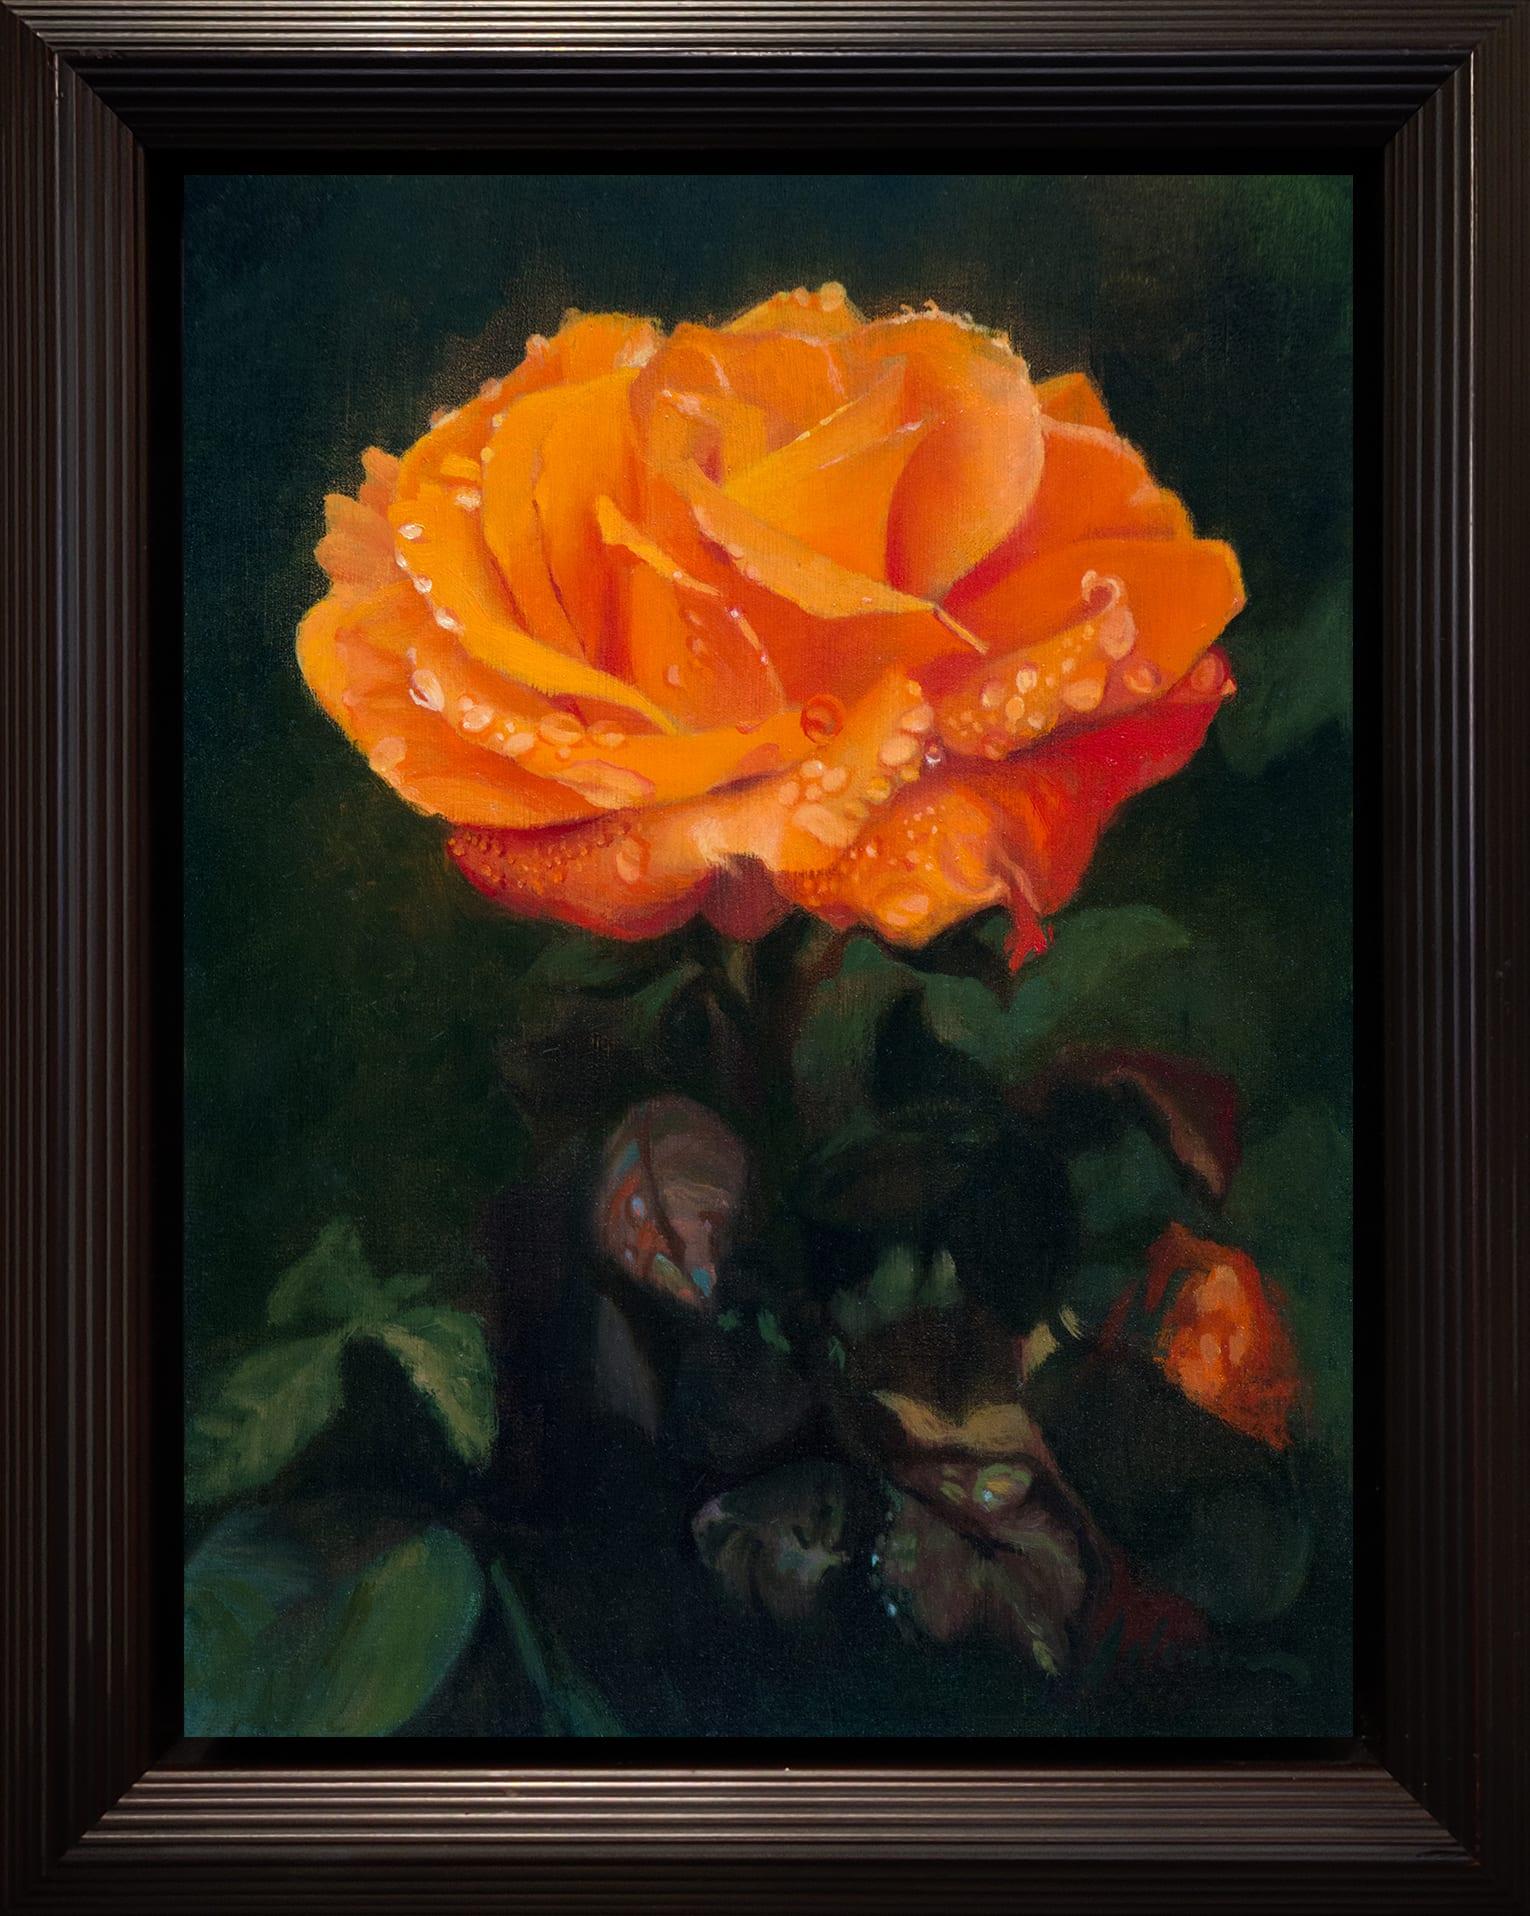 Adams_Orange_Rose_12x9_Frame